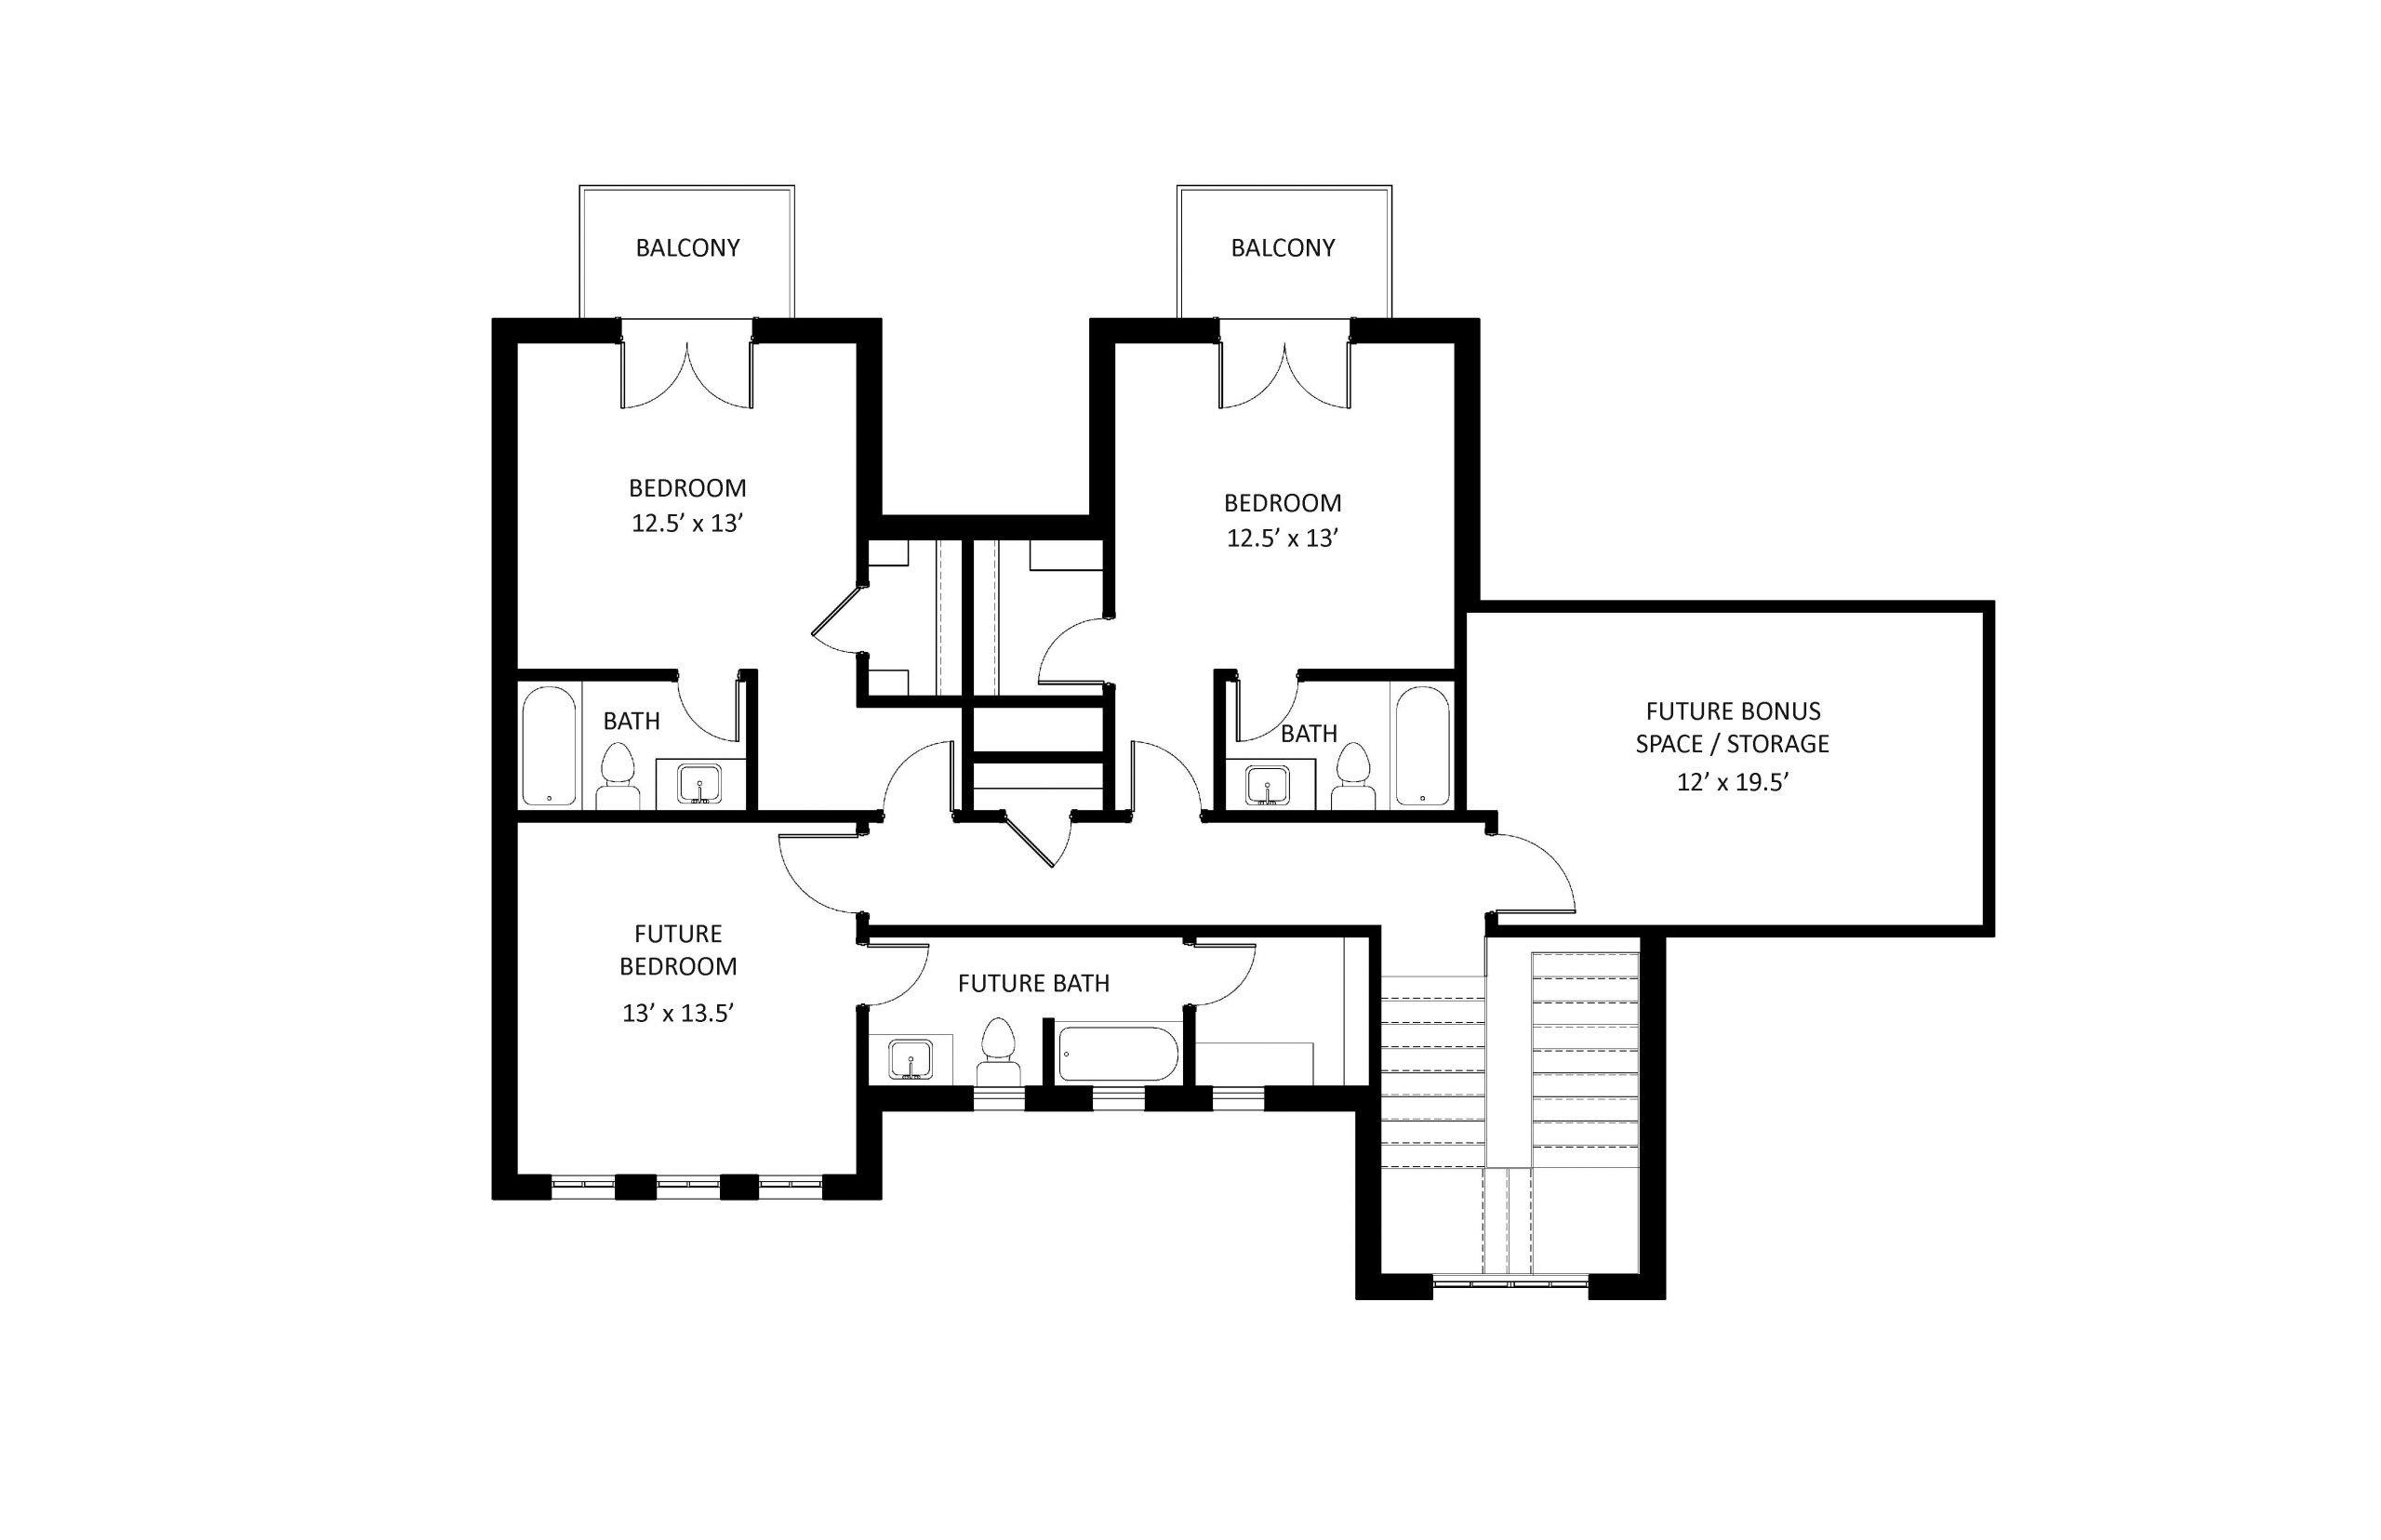 9617 Lakeway Run Floor Plans_Page_2